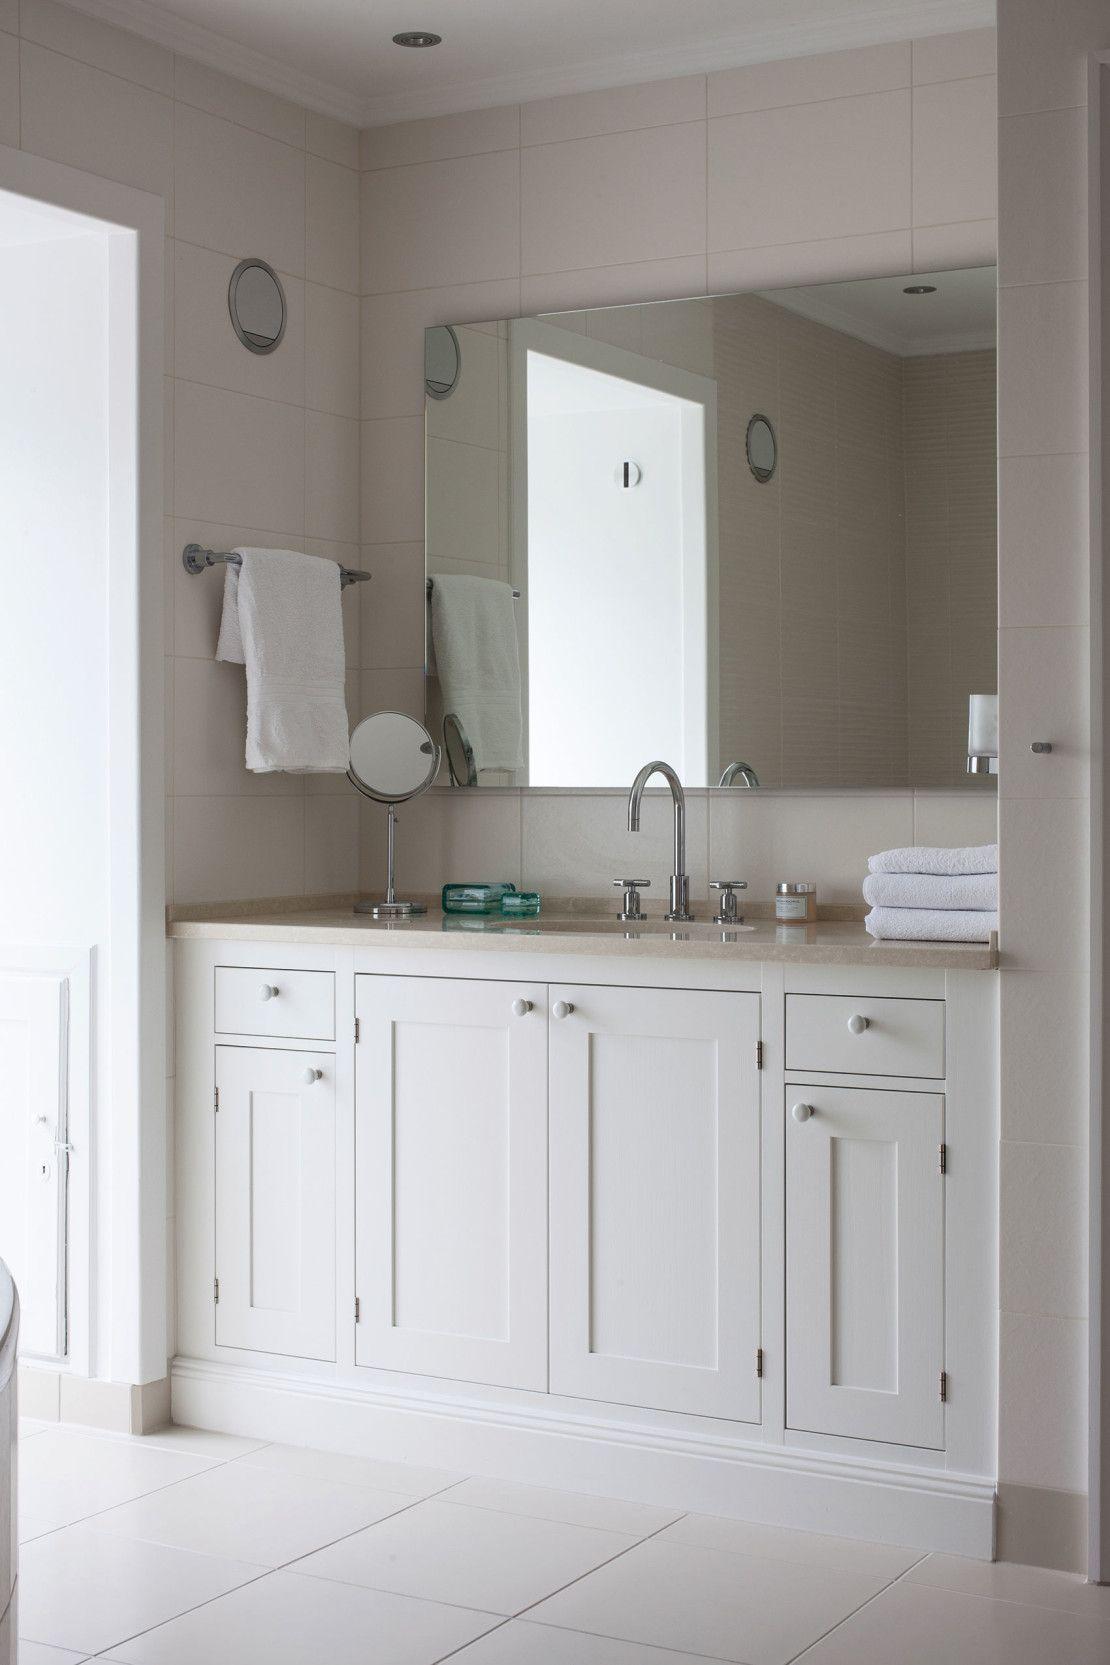 Dalby Soft White - Kvänum | Bathroom inspiration | Pinterest ...